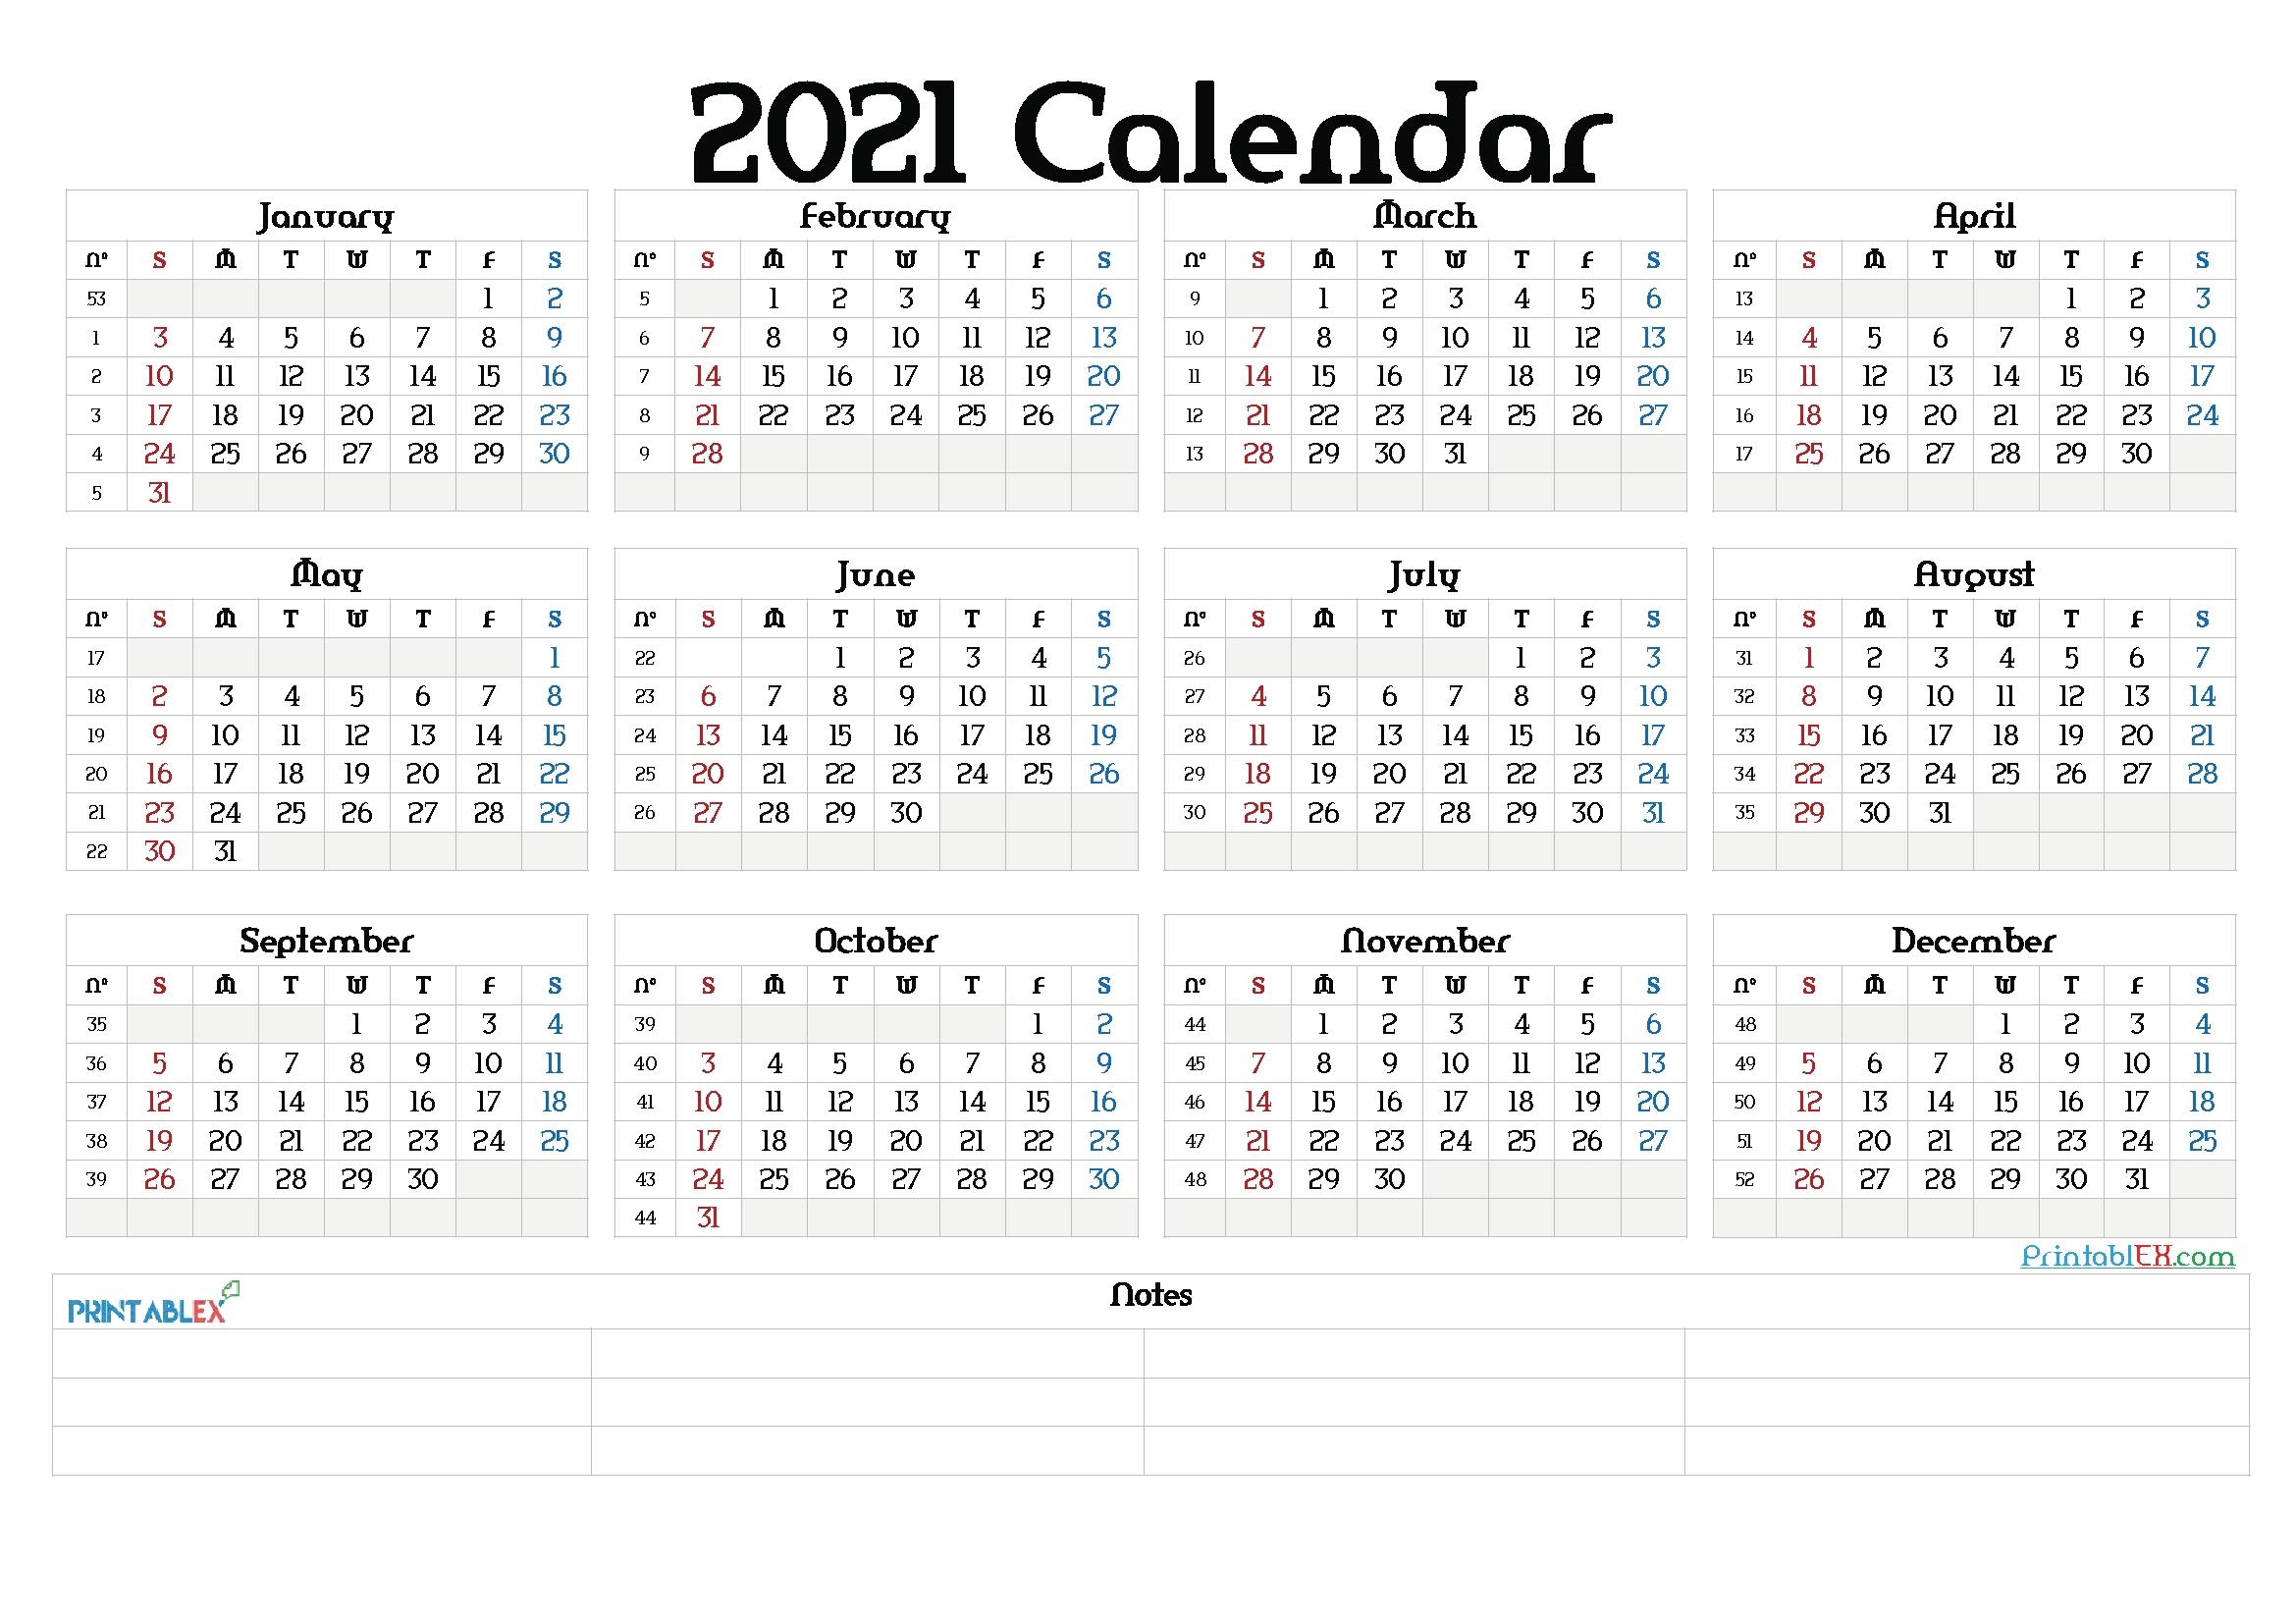 Printable 2021 Yearly Calendar With Week Numbers - 21Ytw77 In 2020 | Free Printable Calendar inside 2021 Calendar Image By Week Numbers Graphics